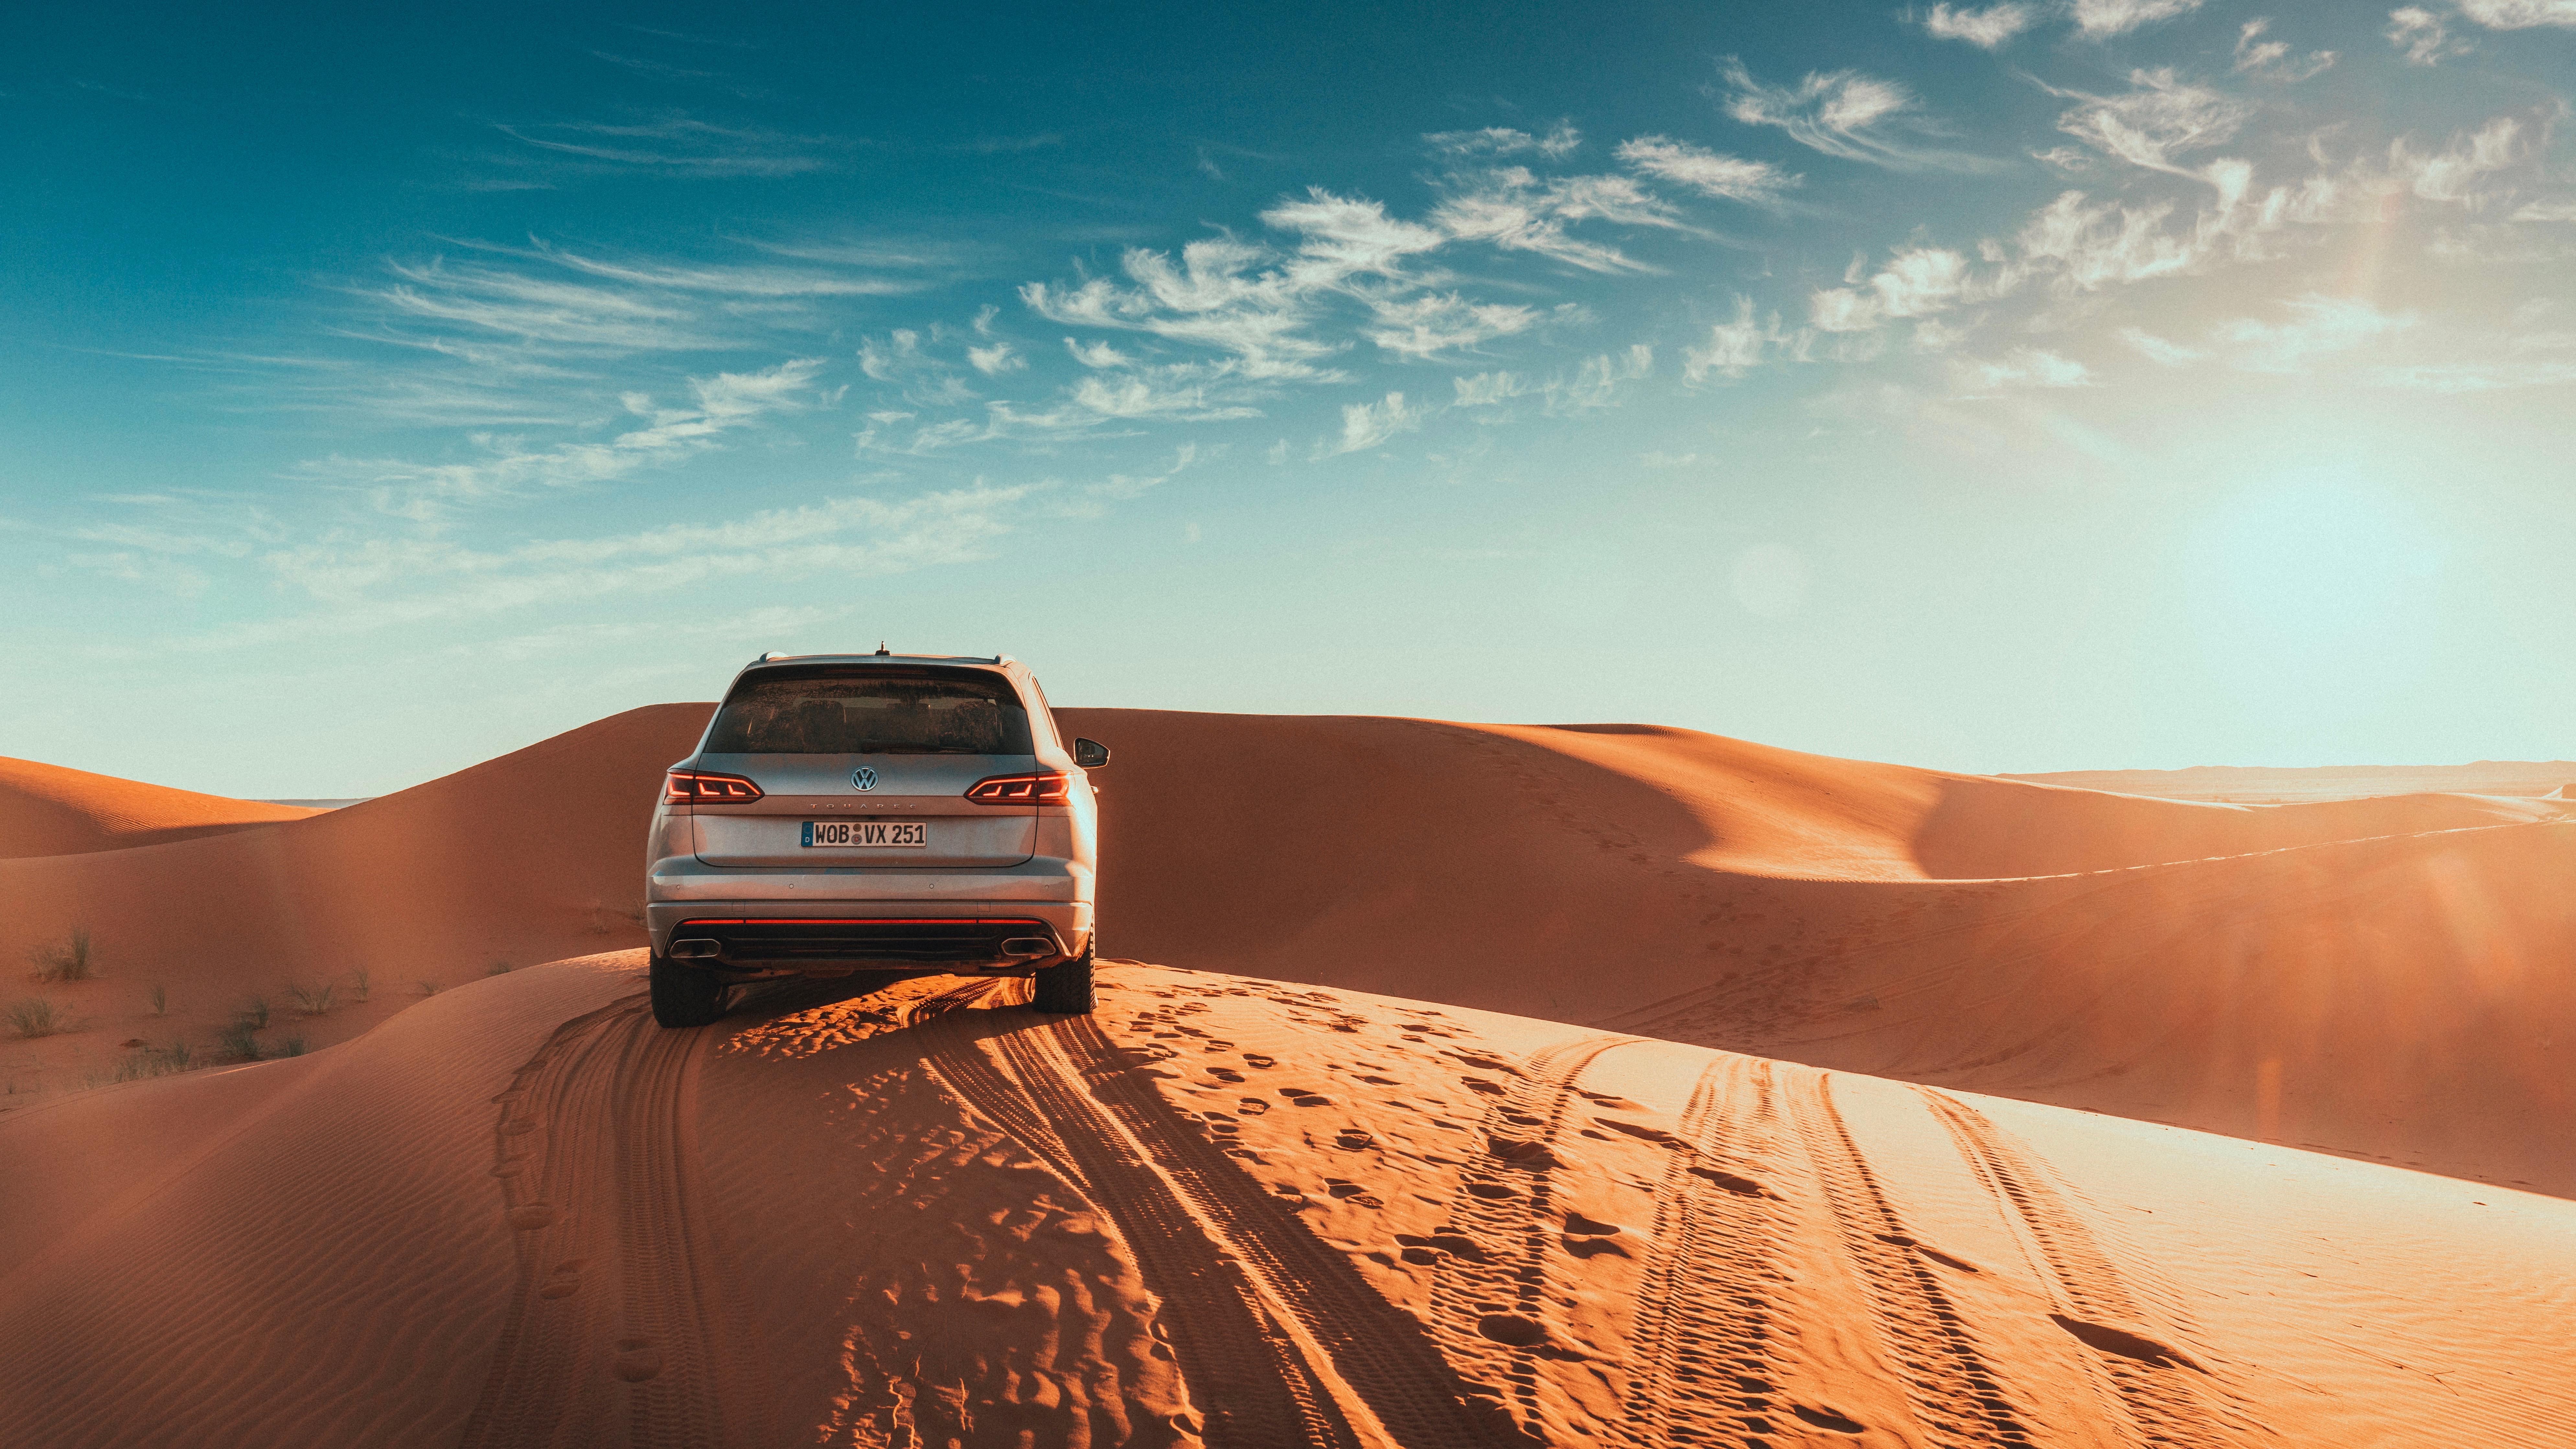 Touareg sand rear